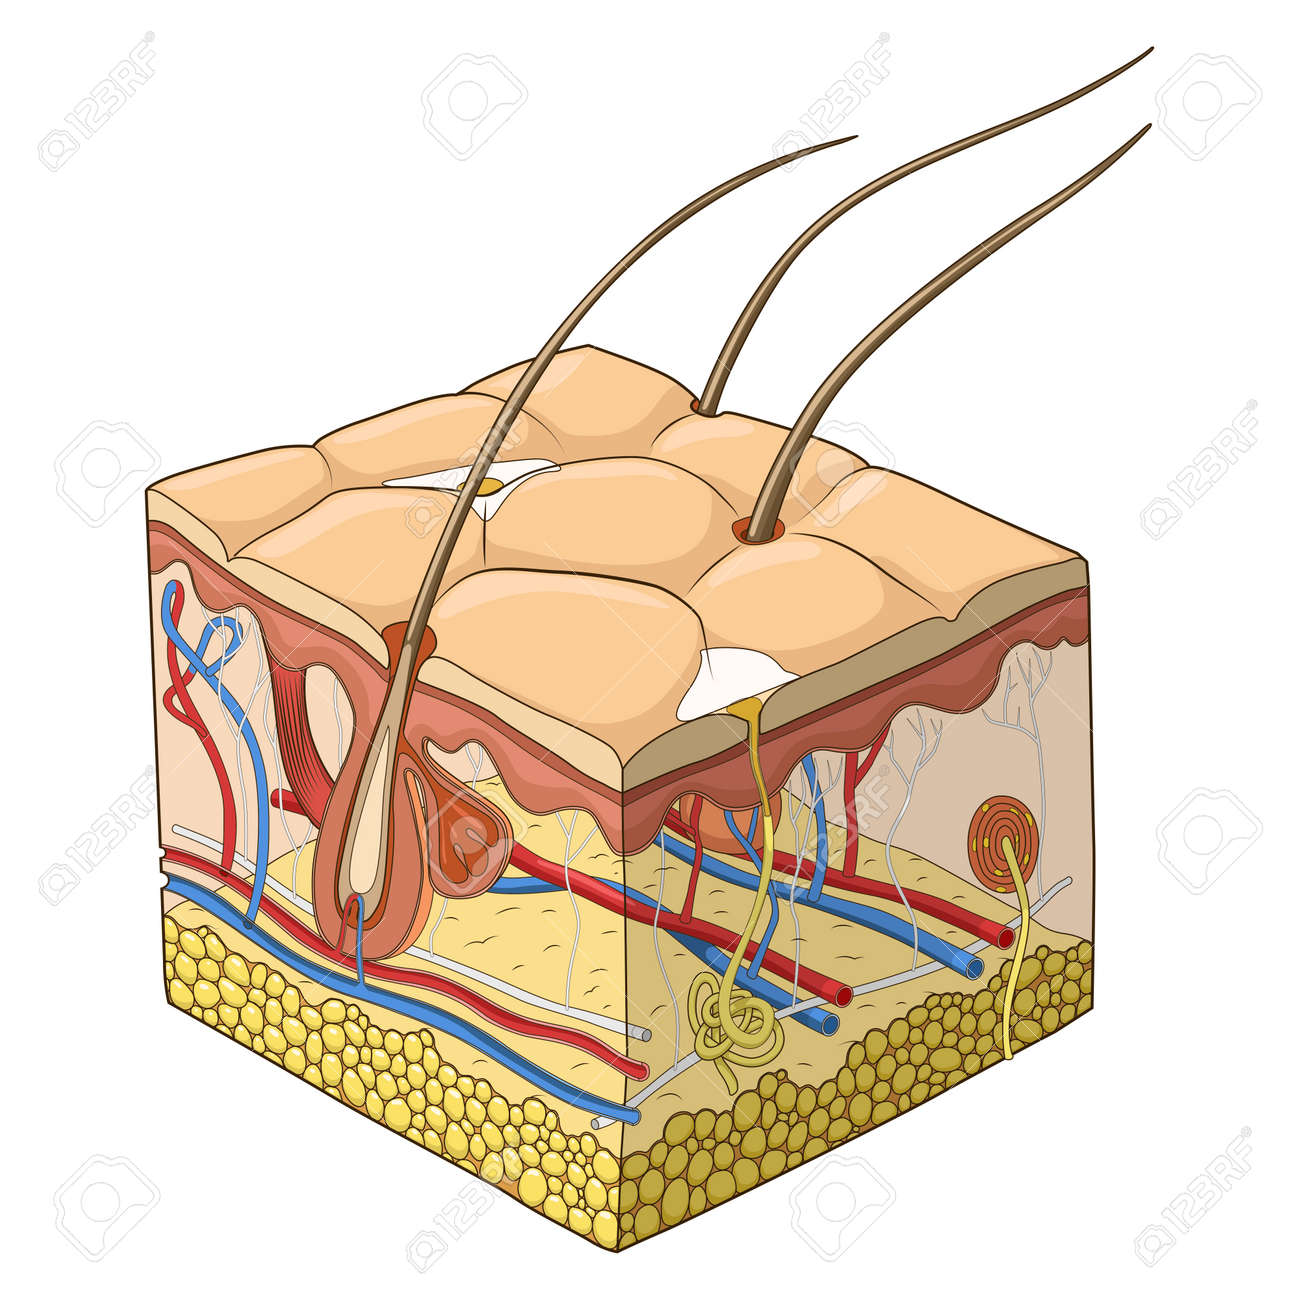 Slice of skin structure medical science educational vector illustration - 46796585